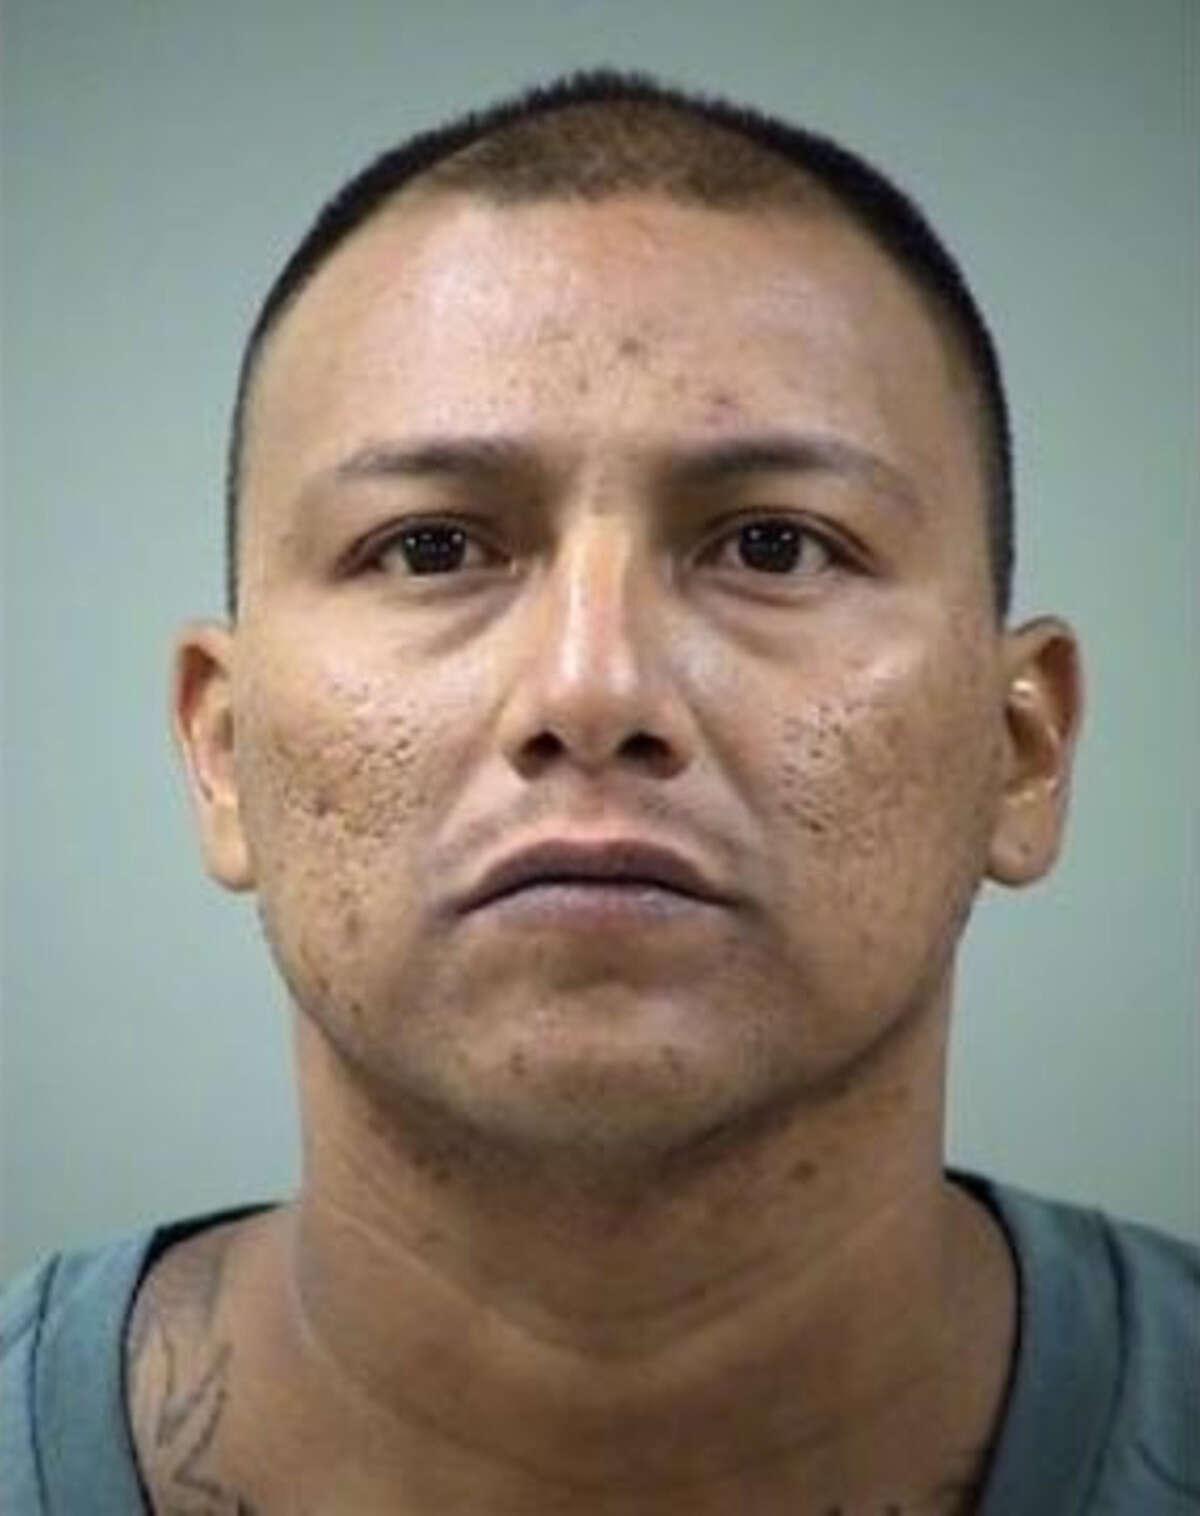 Jose Gutierrez, 33, is accused of murder in the shooting death of Raul Garcia, 31, on Aug. 30, 2013.